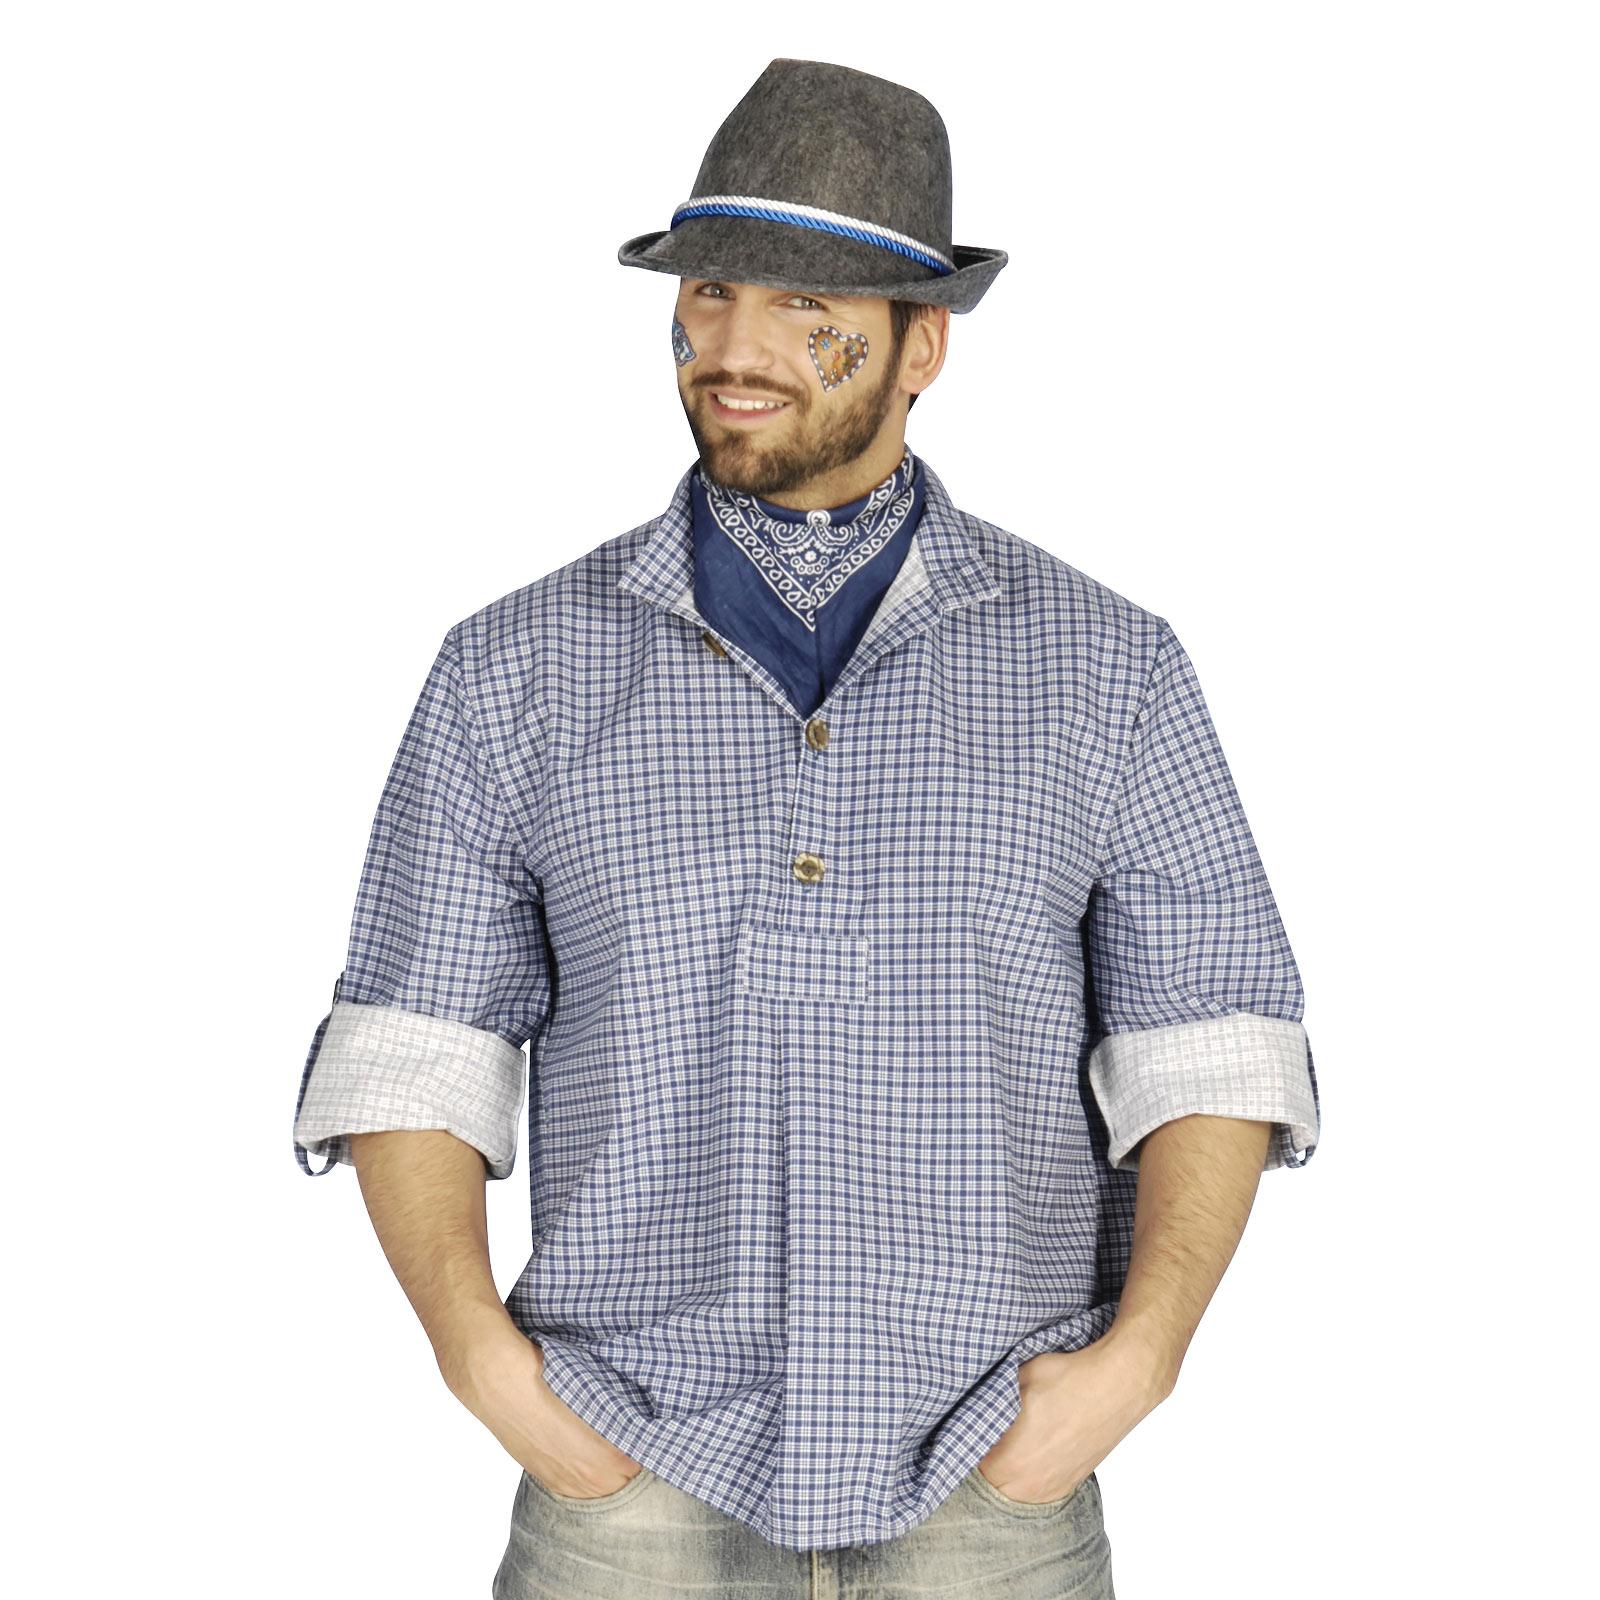 Franzl Trachtenhemd